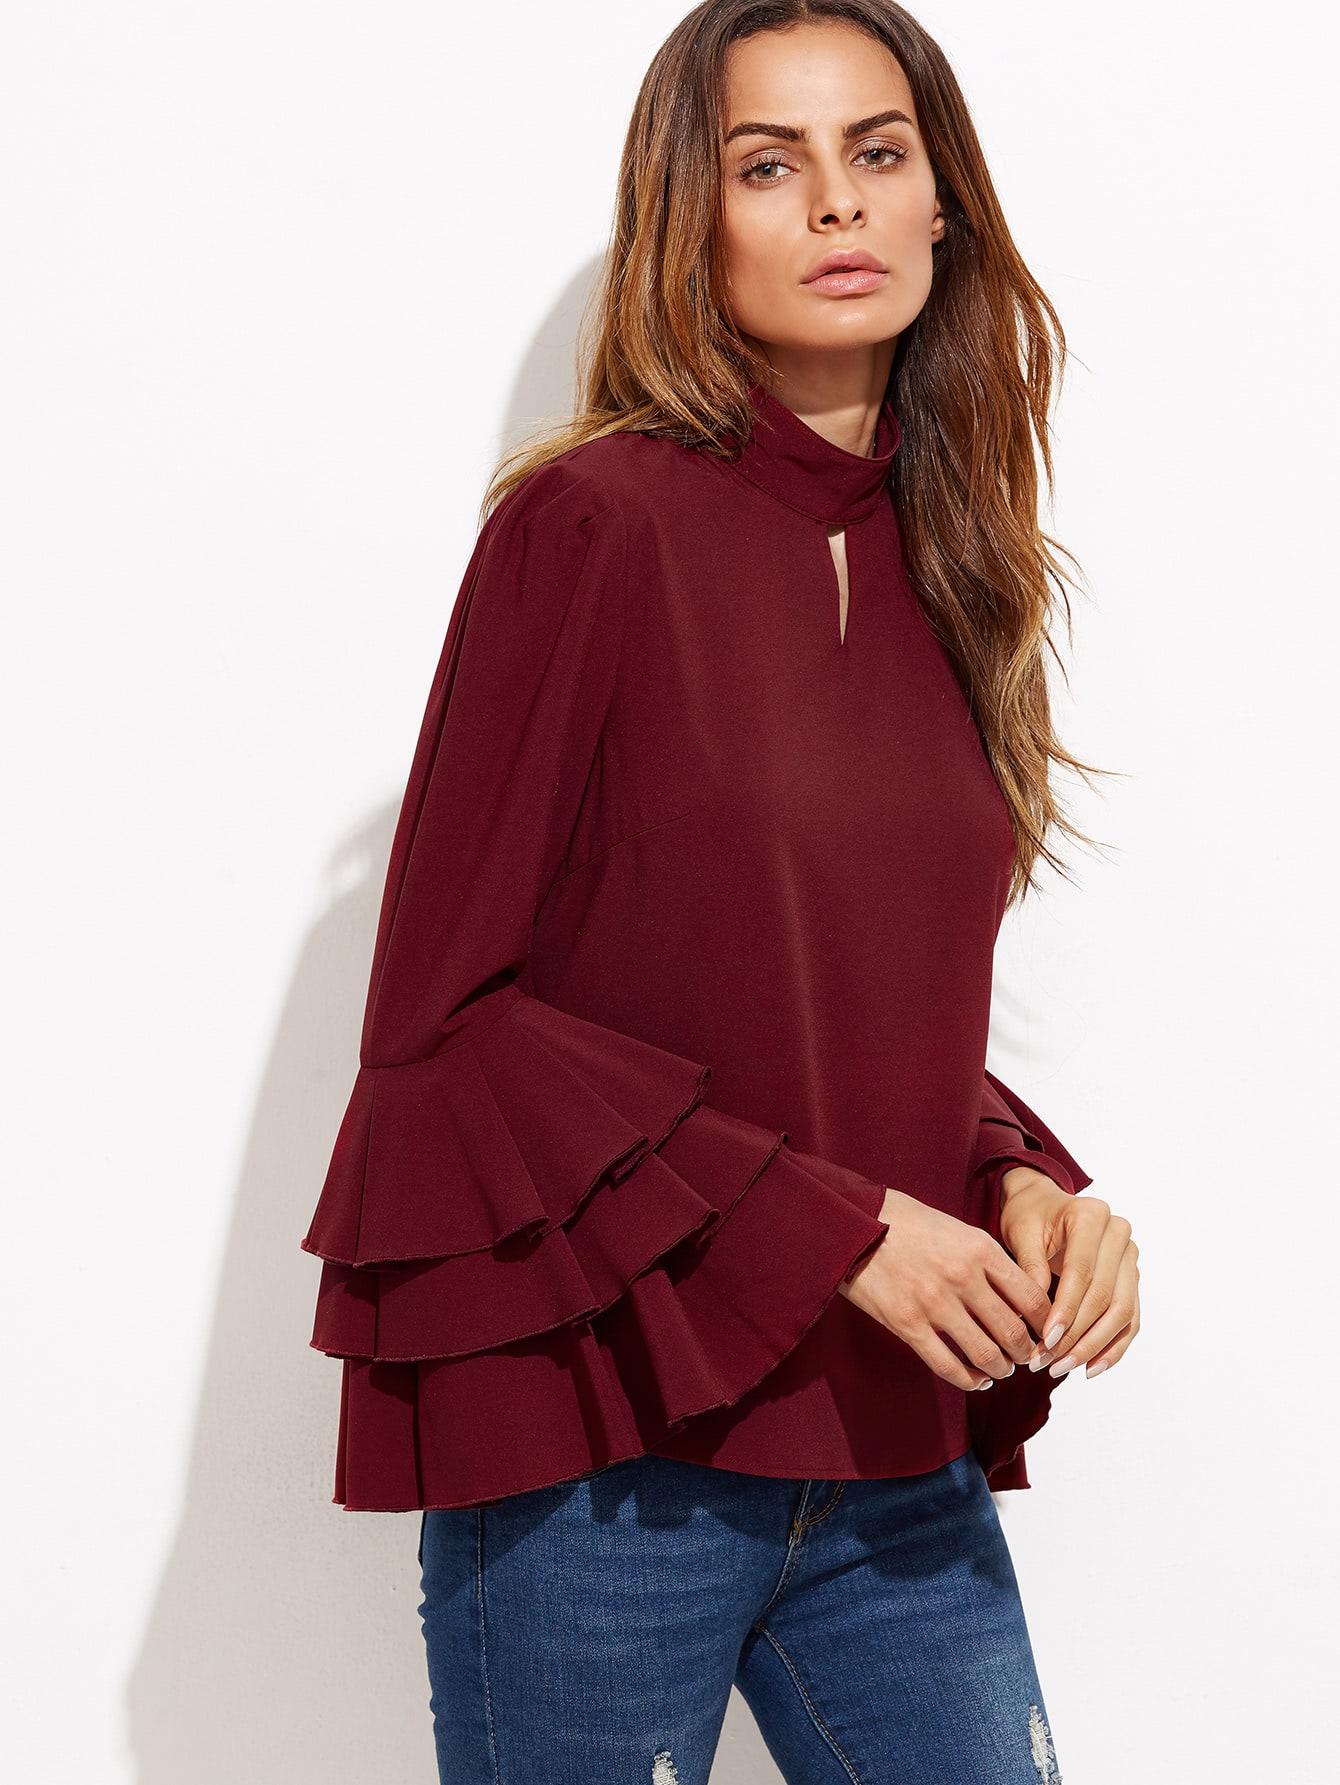 blouse160916701_2